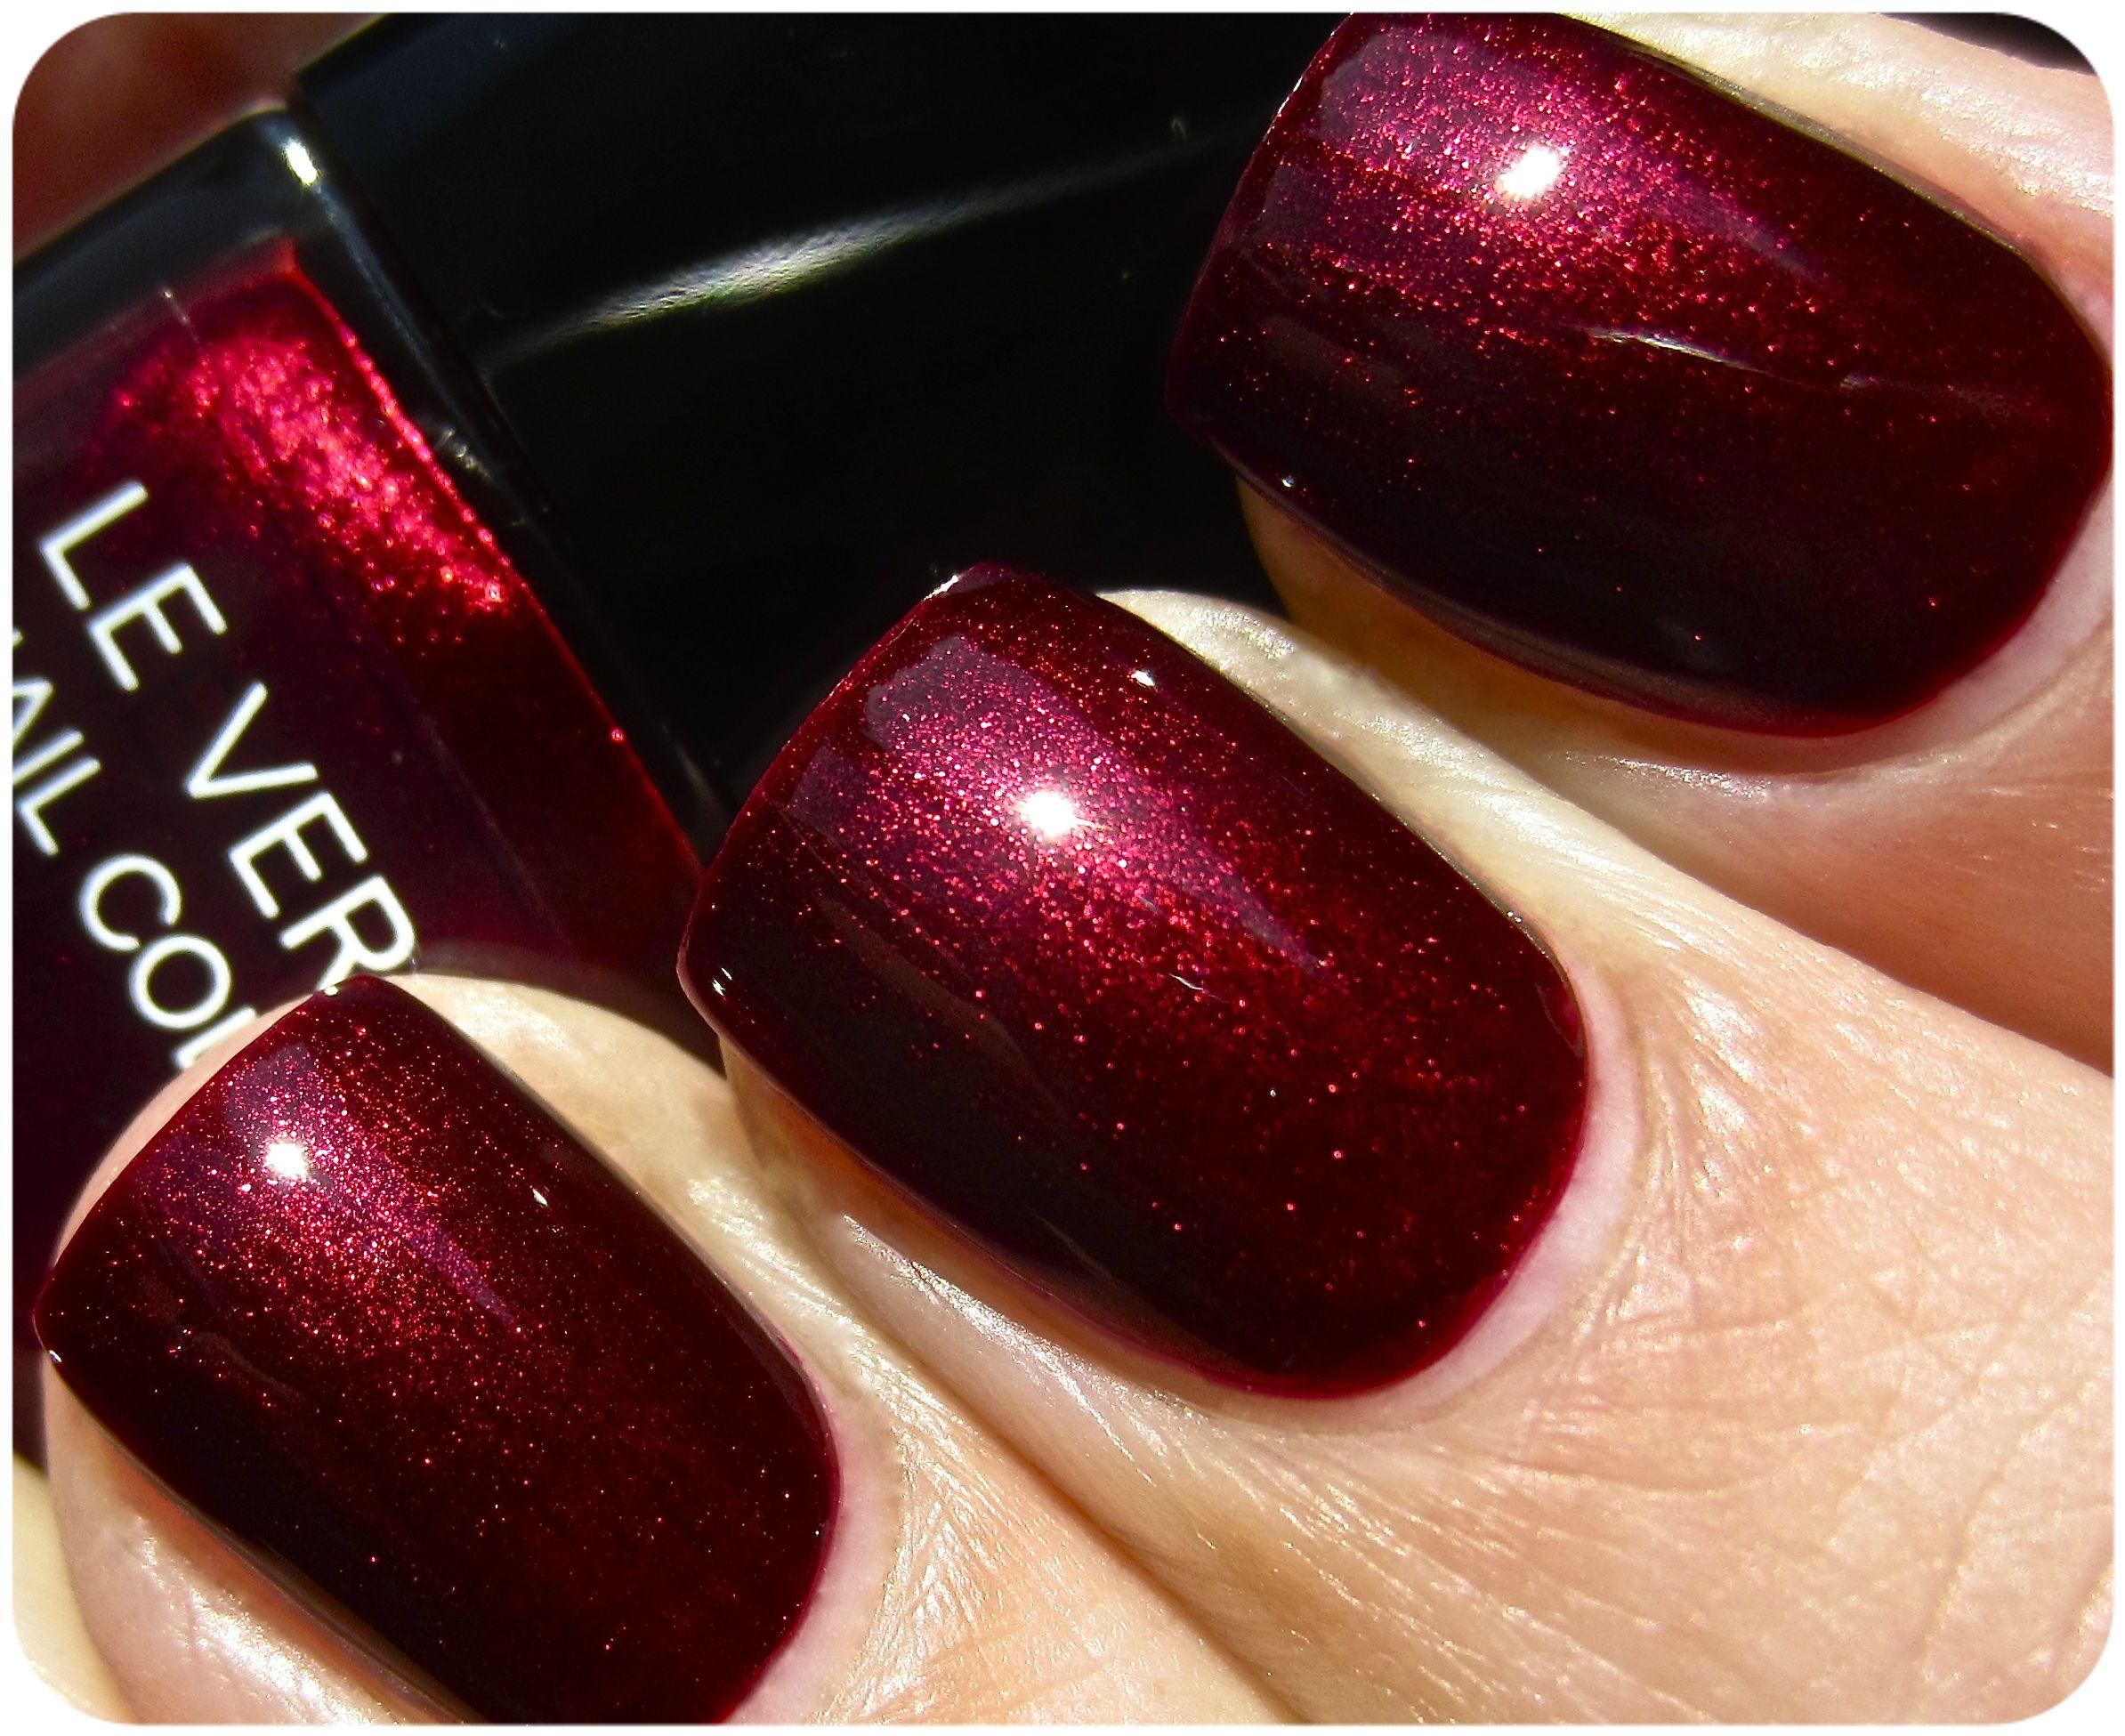 Chanel Le Vernis Malice By Ommorphia Brannak Chanel Nail Polish Chanel Nails Nail Polish